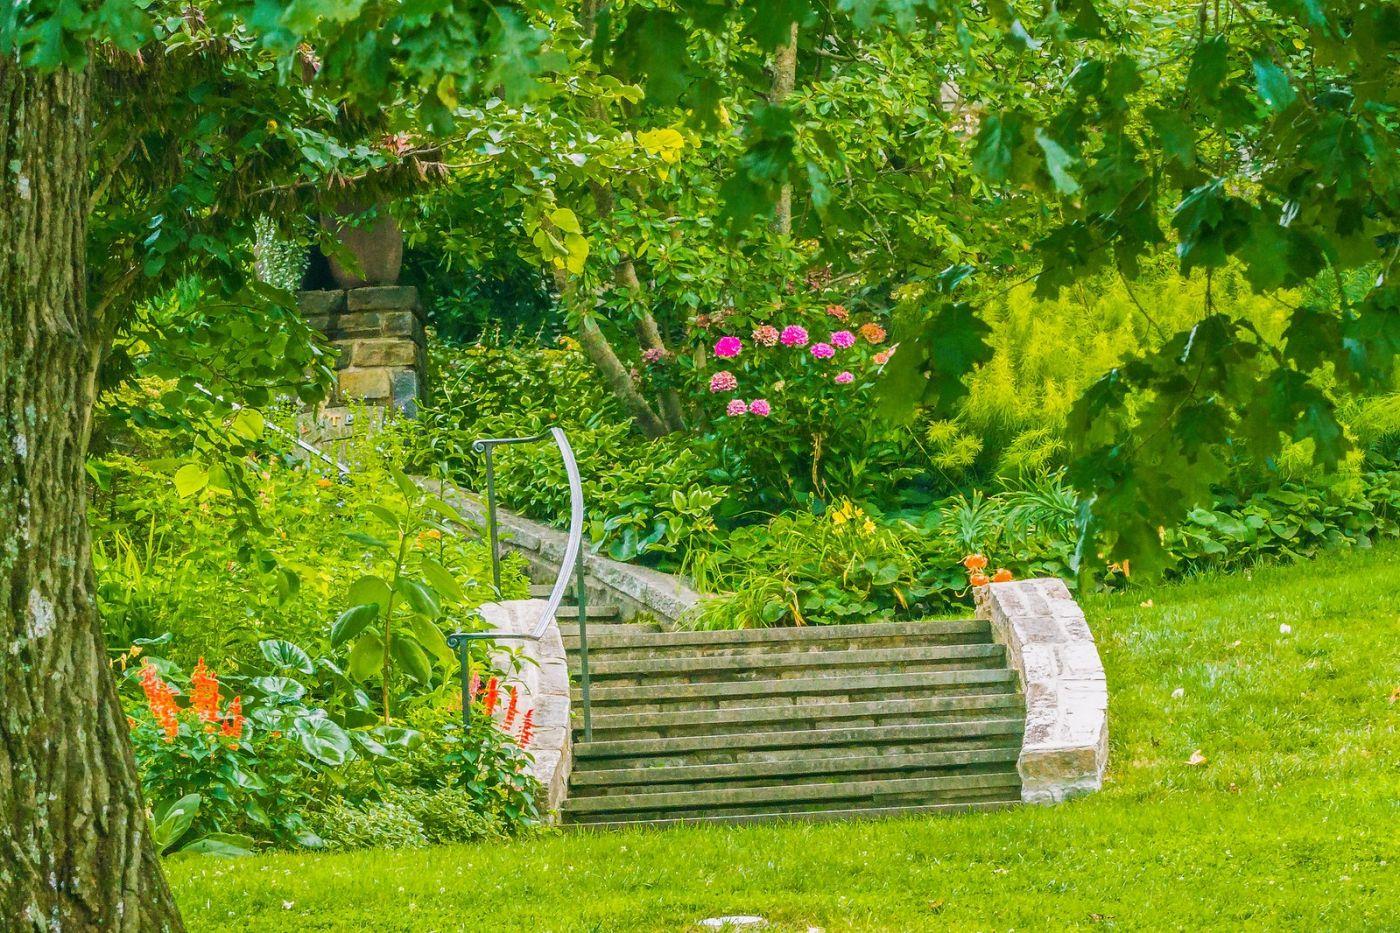 Chanticleer花园,春风得意_图1-34